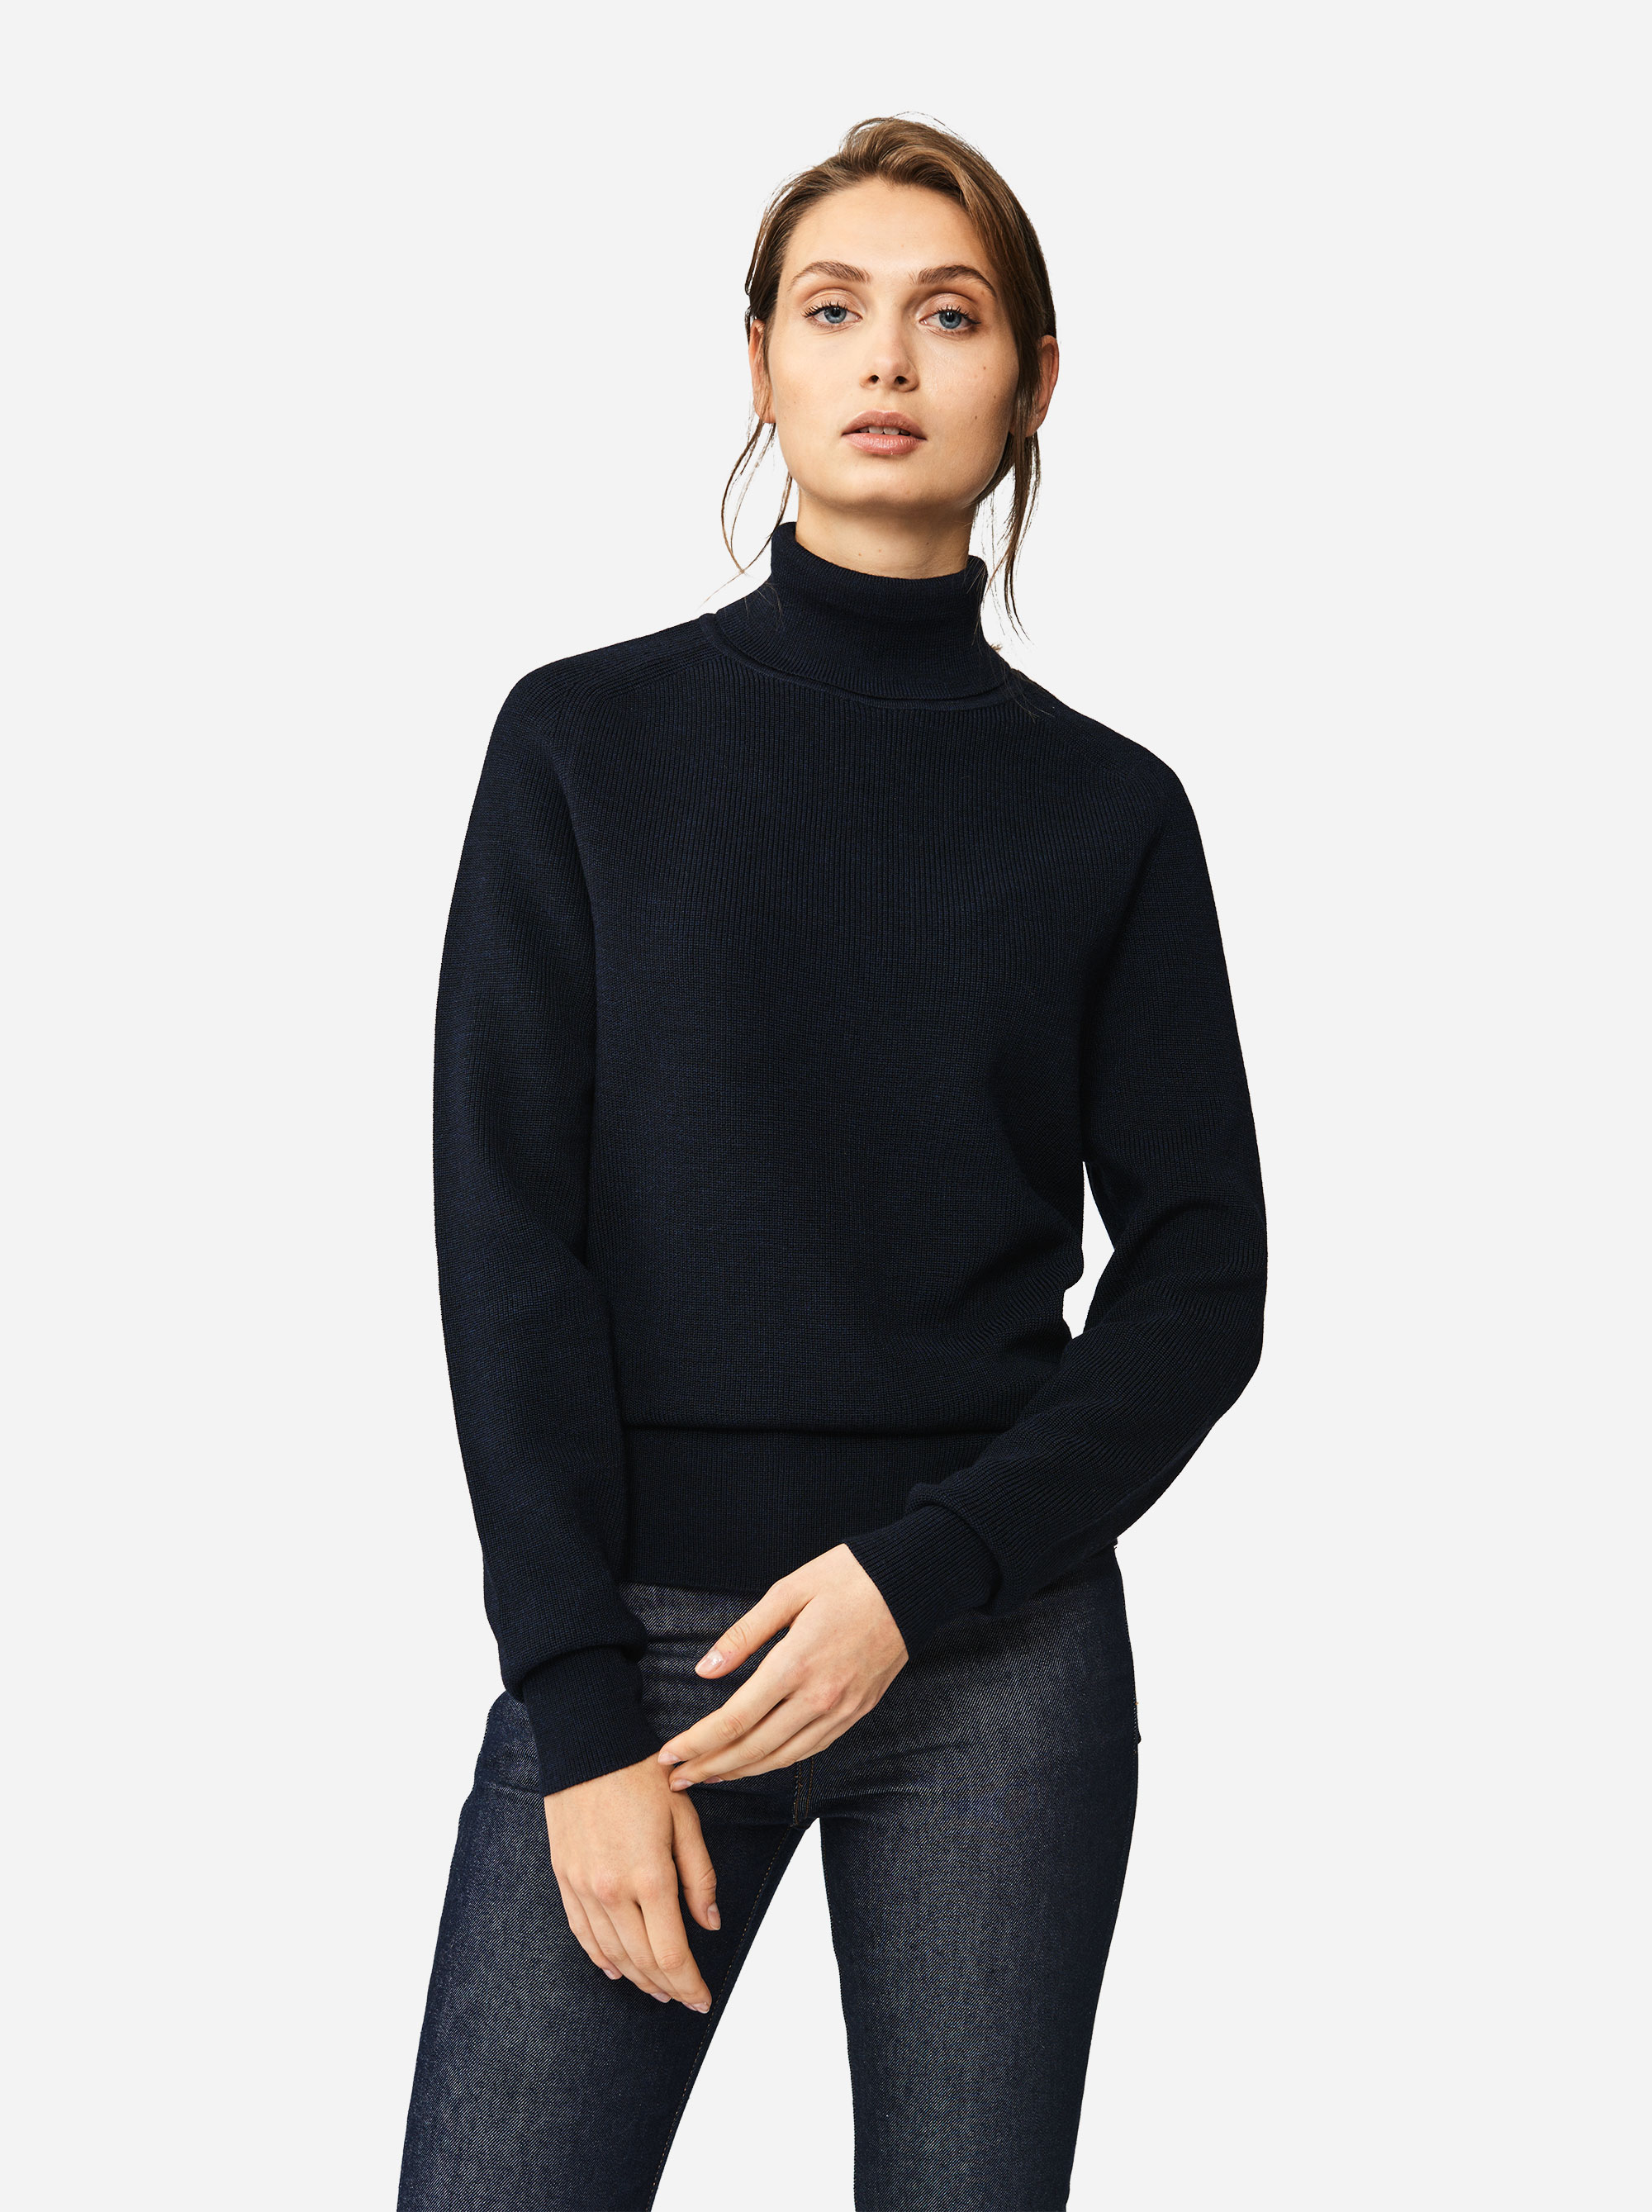 Teym - Turtleneck - The Merino Sweater - Men - Blue - 4